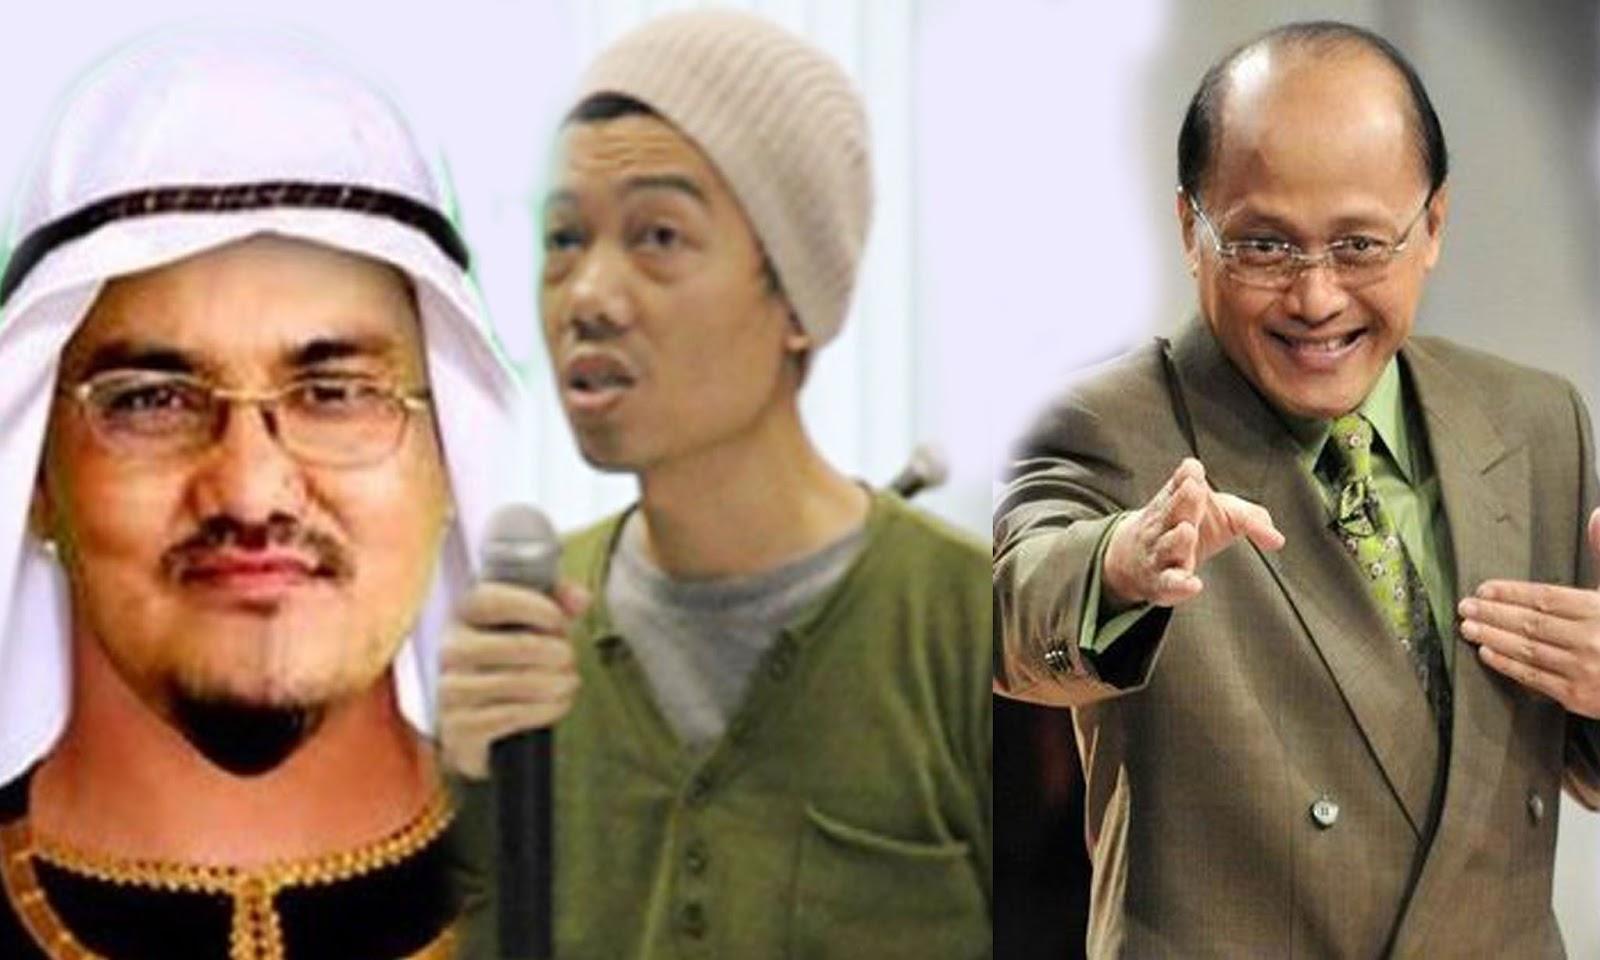 Motivasi Hebat Sebatas Mulut Begini Kejamnya Netizen Bully Mario